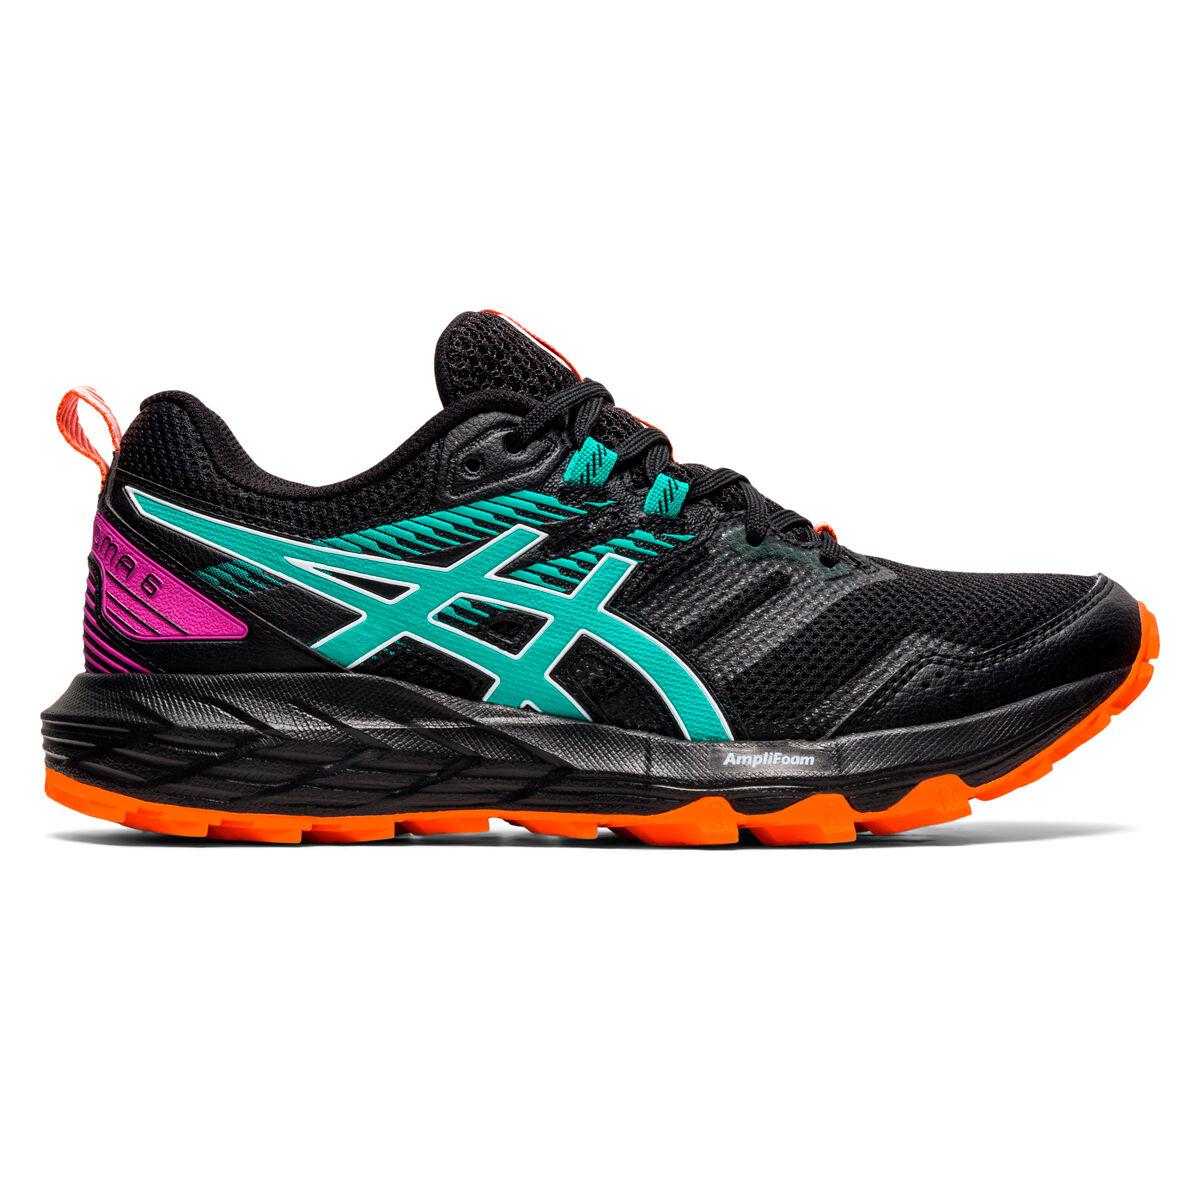 Asics GEL Sonoma 6 Womens Trail Running Shoes